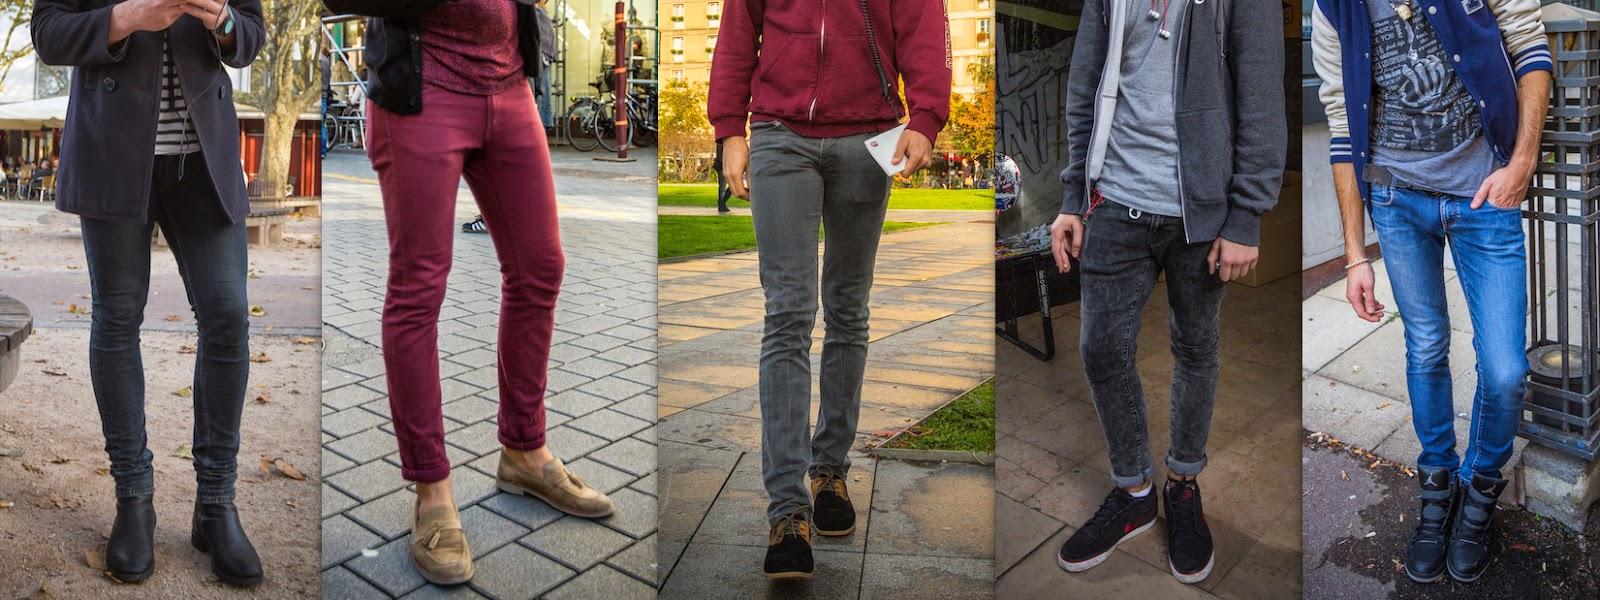 Risiko pakai skinny jeans